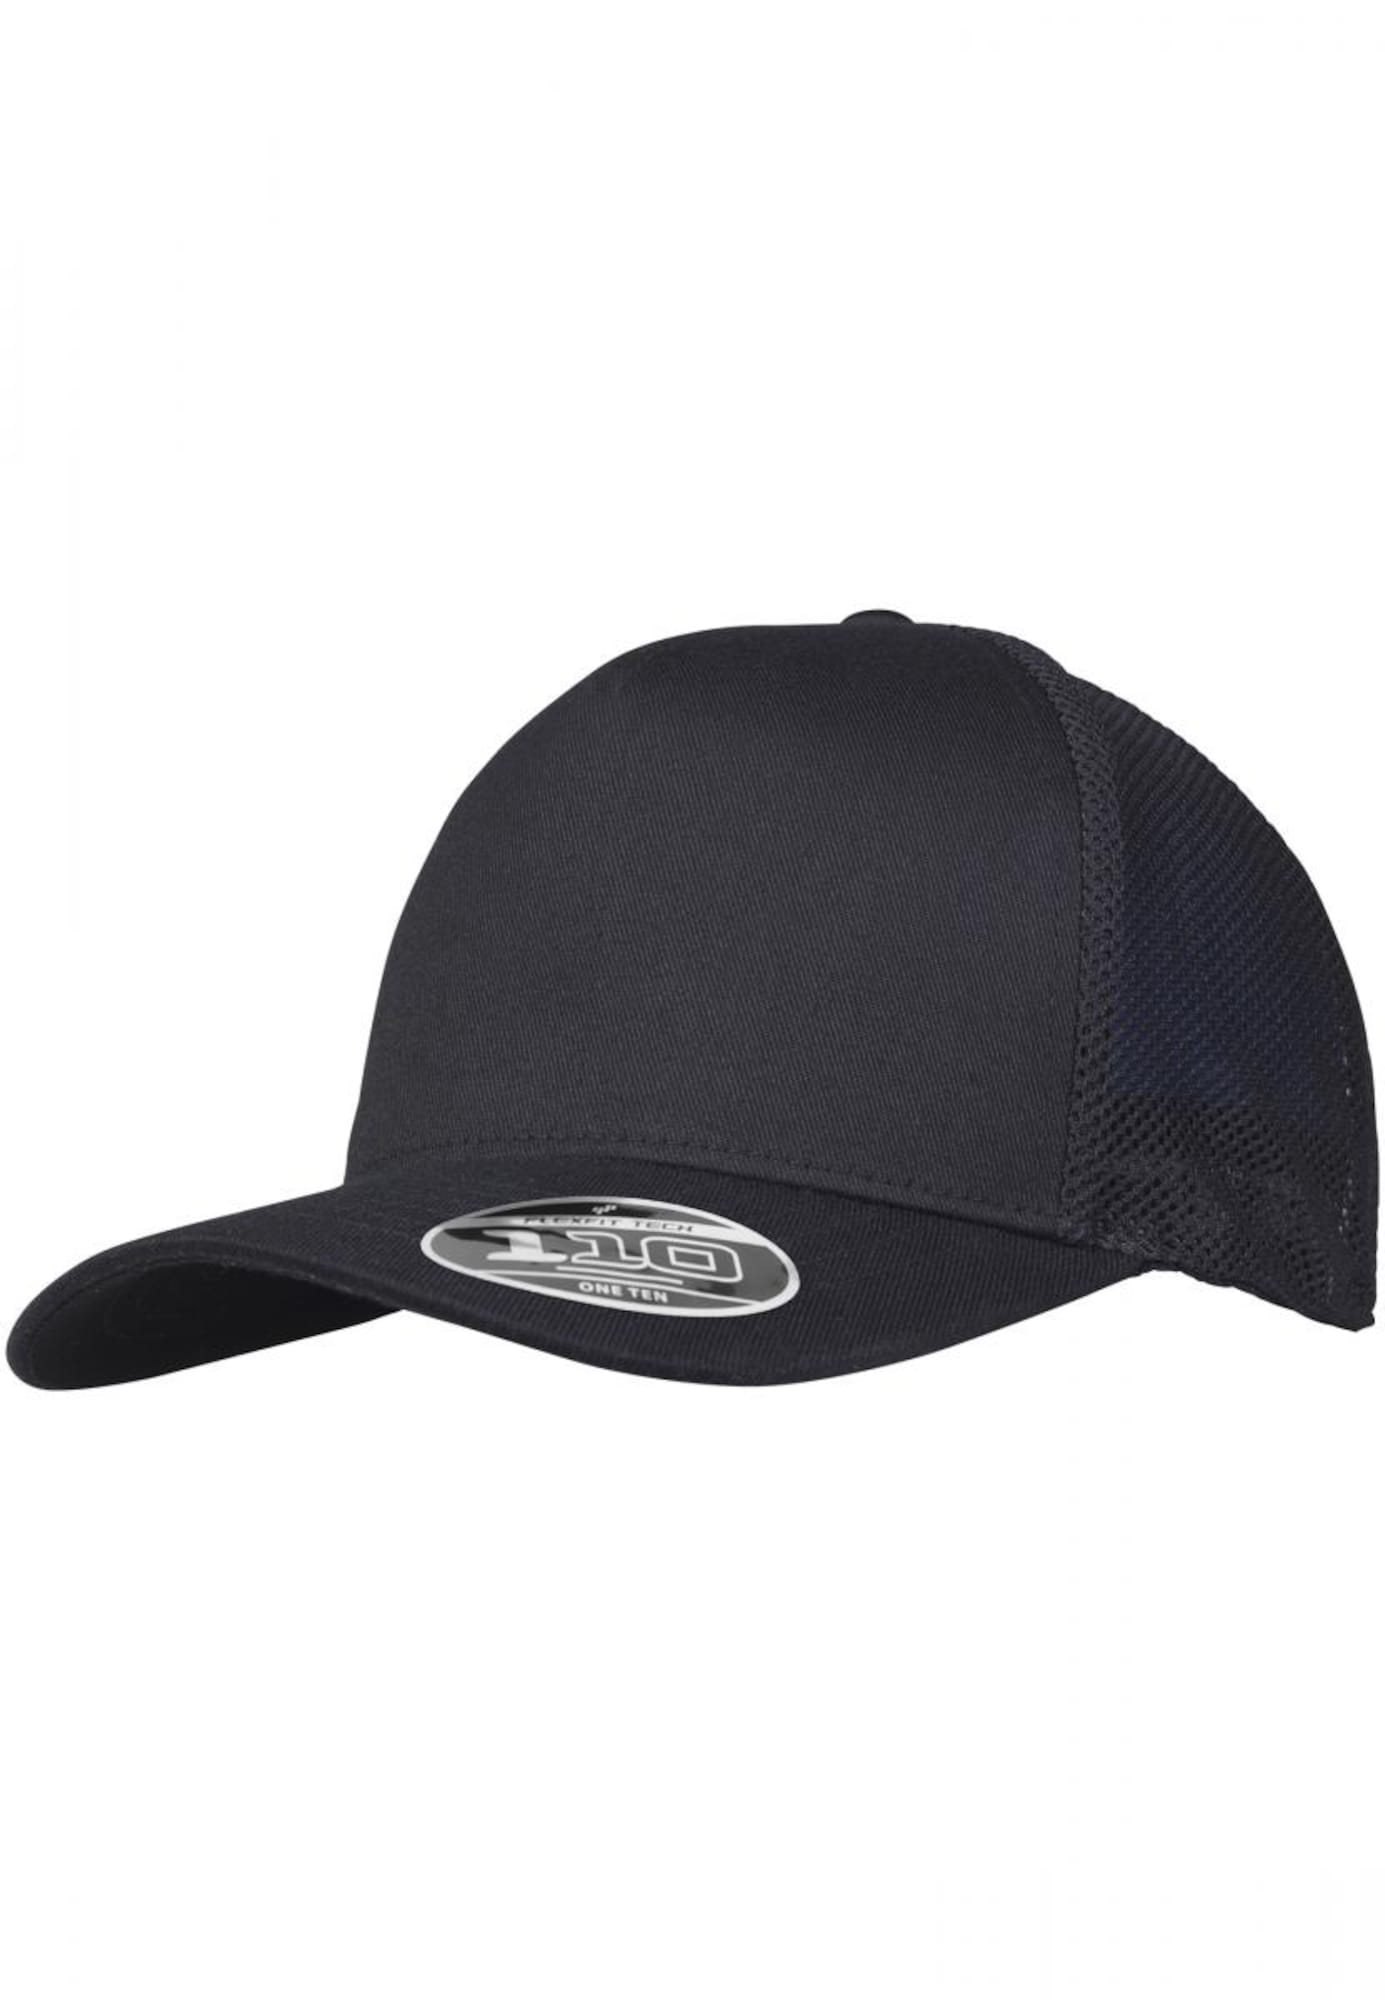 Cap '110 Trucker' | Accessoires > Caps | Flexfit